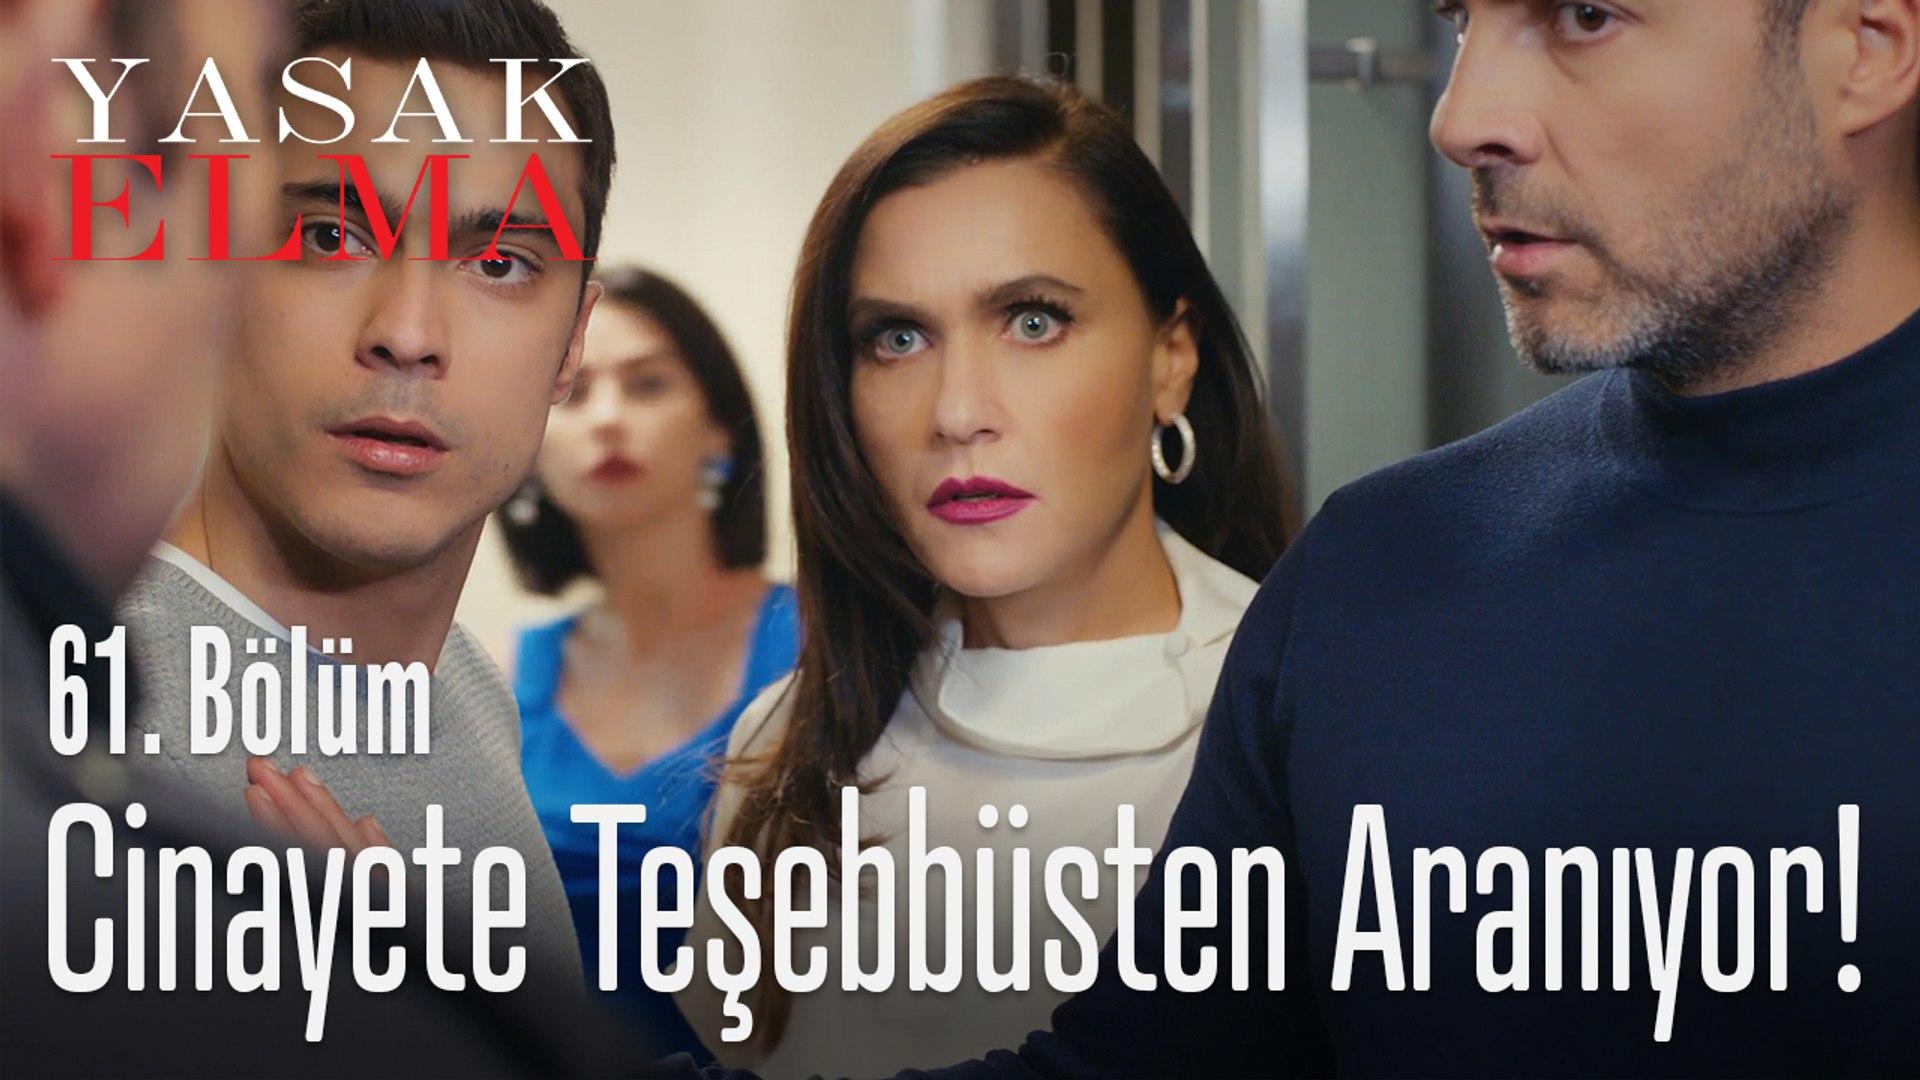 Yiğit'i kaçırma operasyonu! - Yasak Elma 61. Bölüm